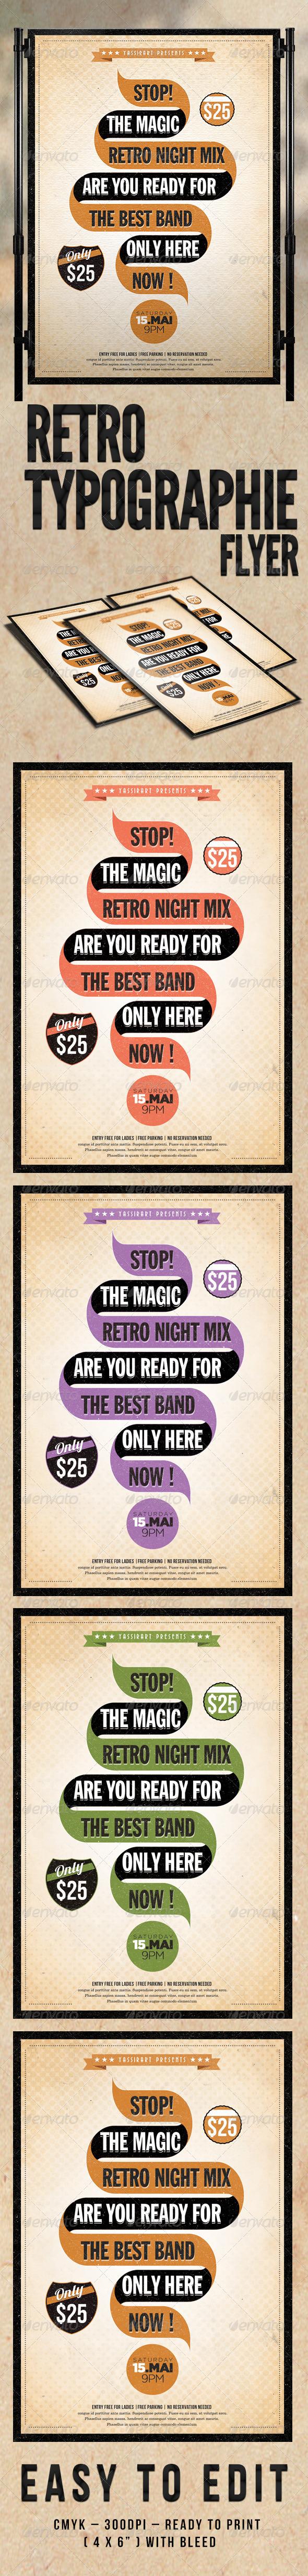 GraphicRiver Retro Typographie Flyer Template 4457137